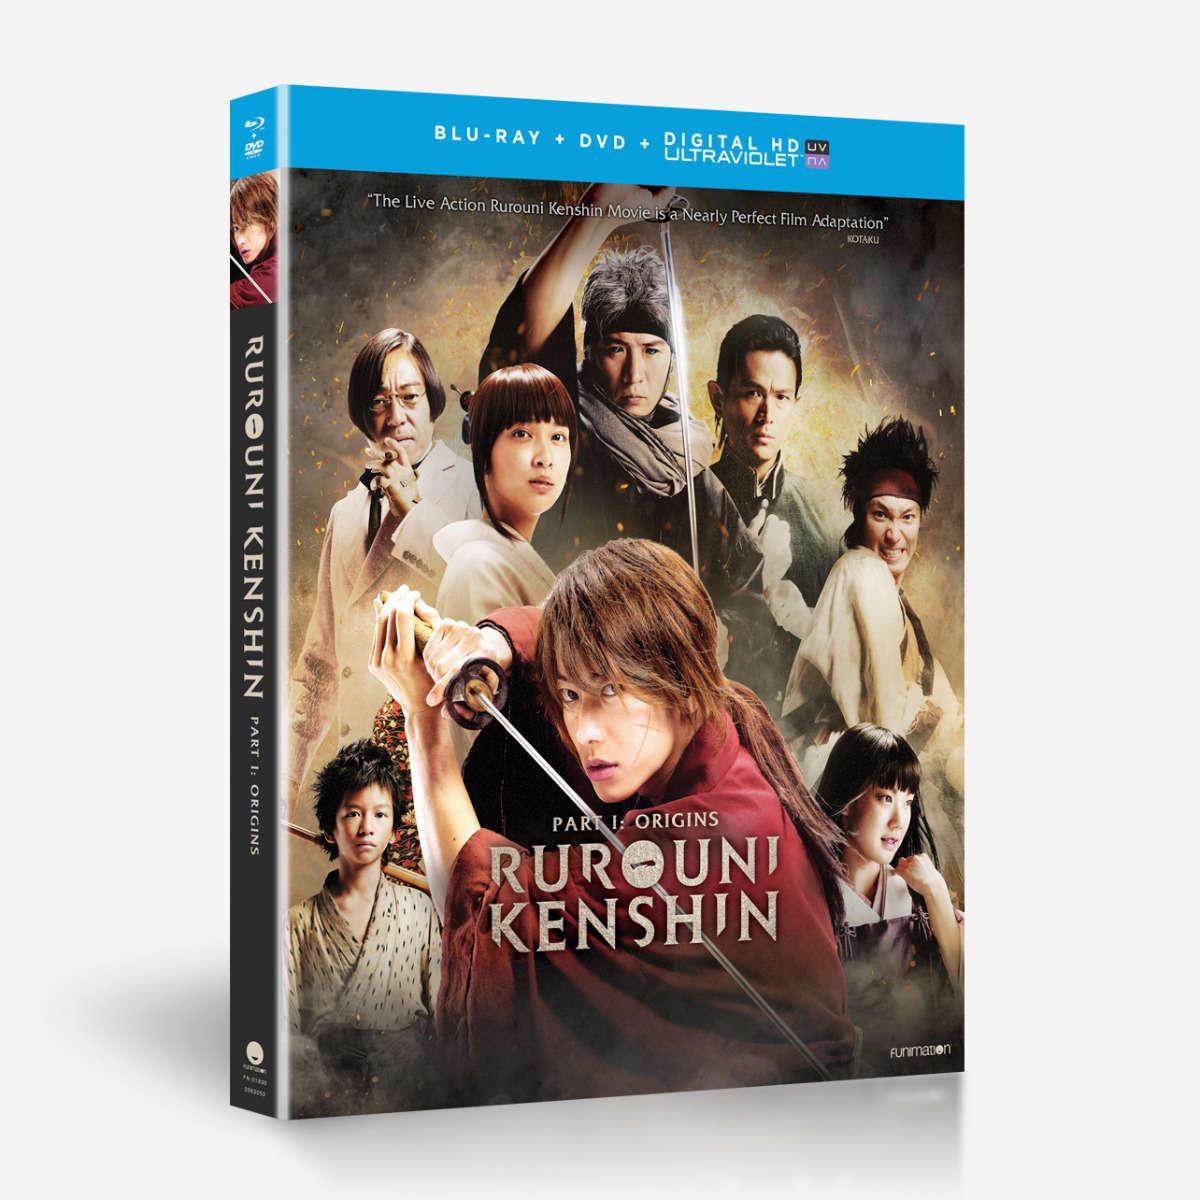 Rurouni Kenshin Season 1: Find Anime SALE Online At Funimation